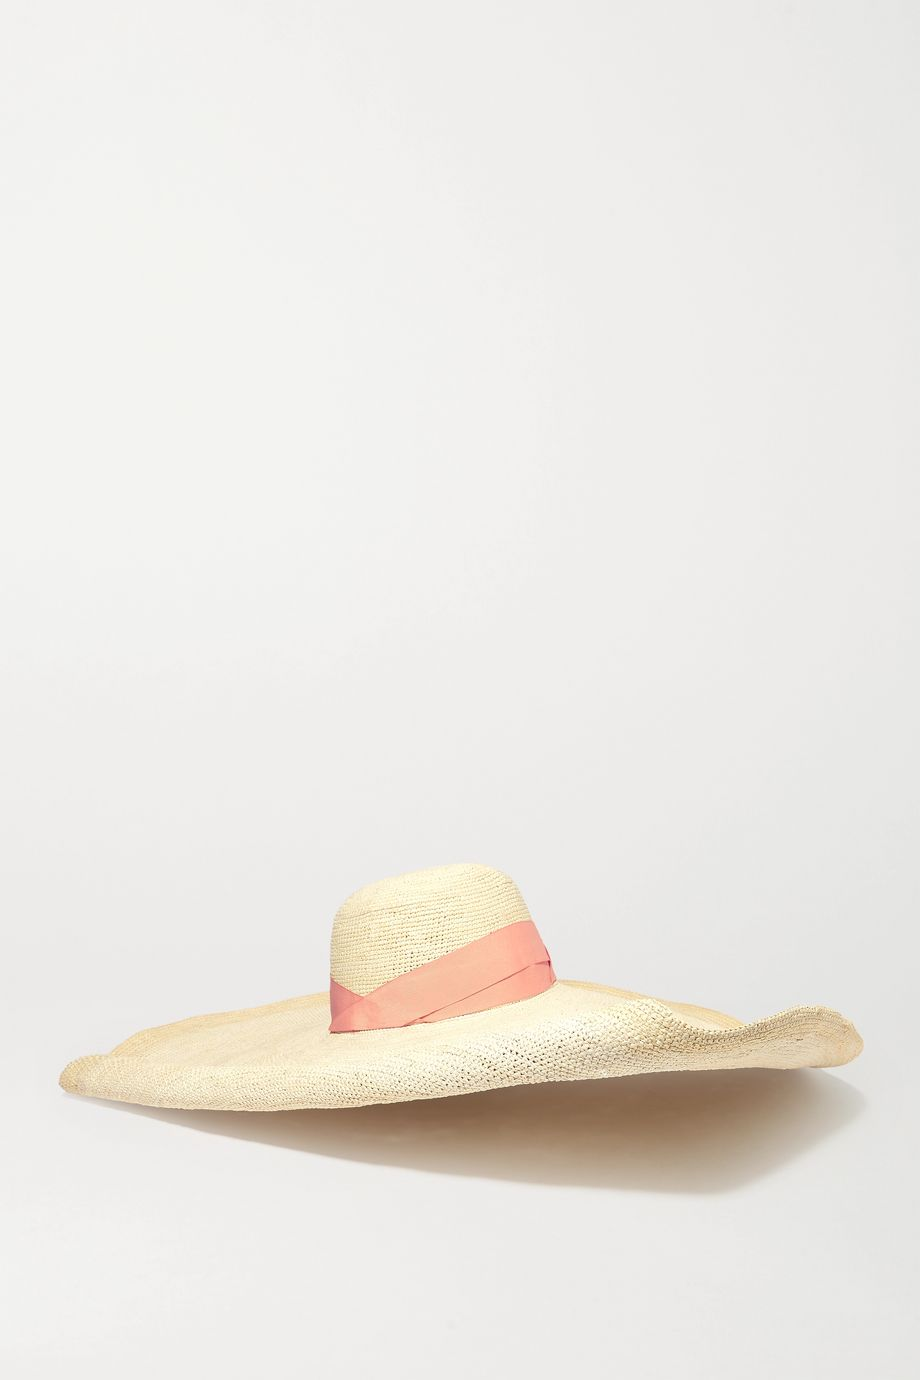 Sensi Studio Oversized grosgrain-trimmed toquilla straw hat